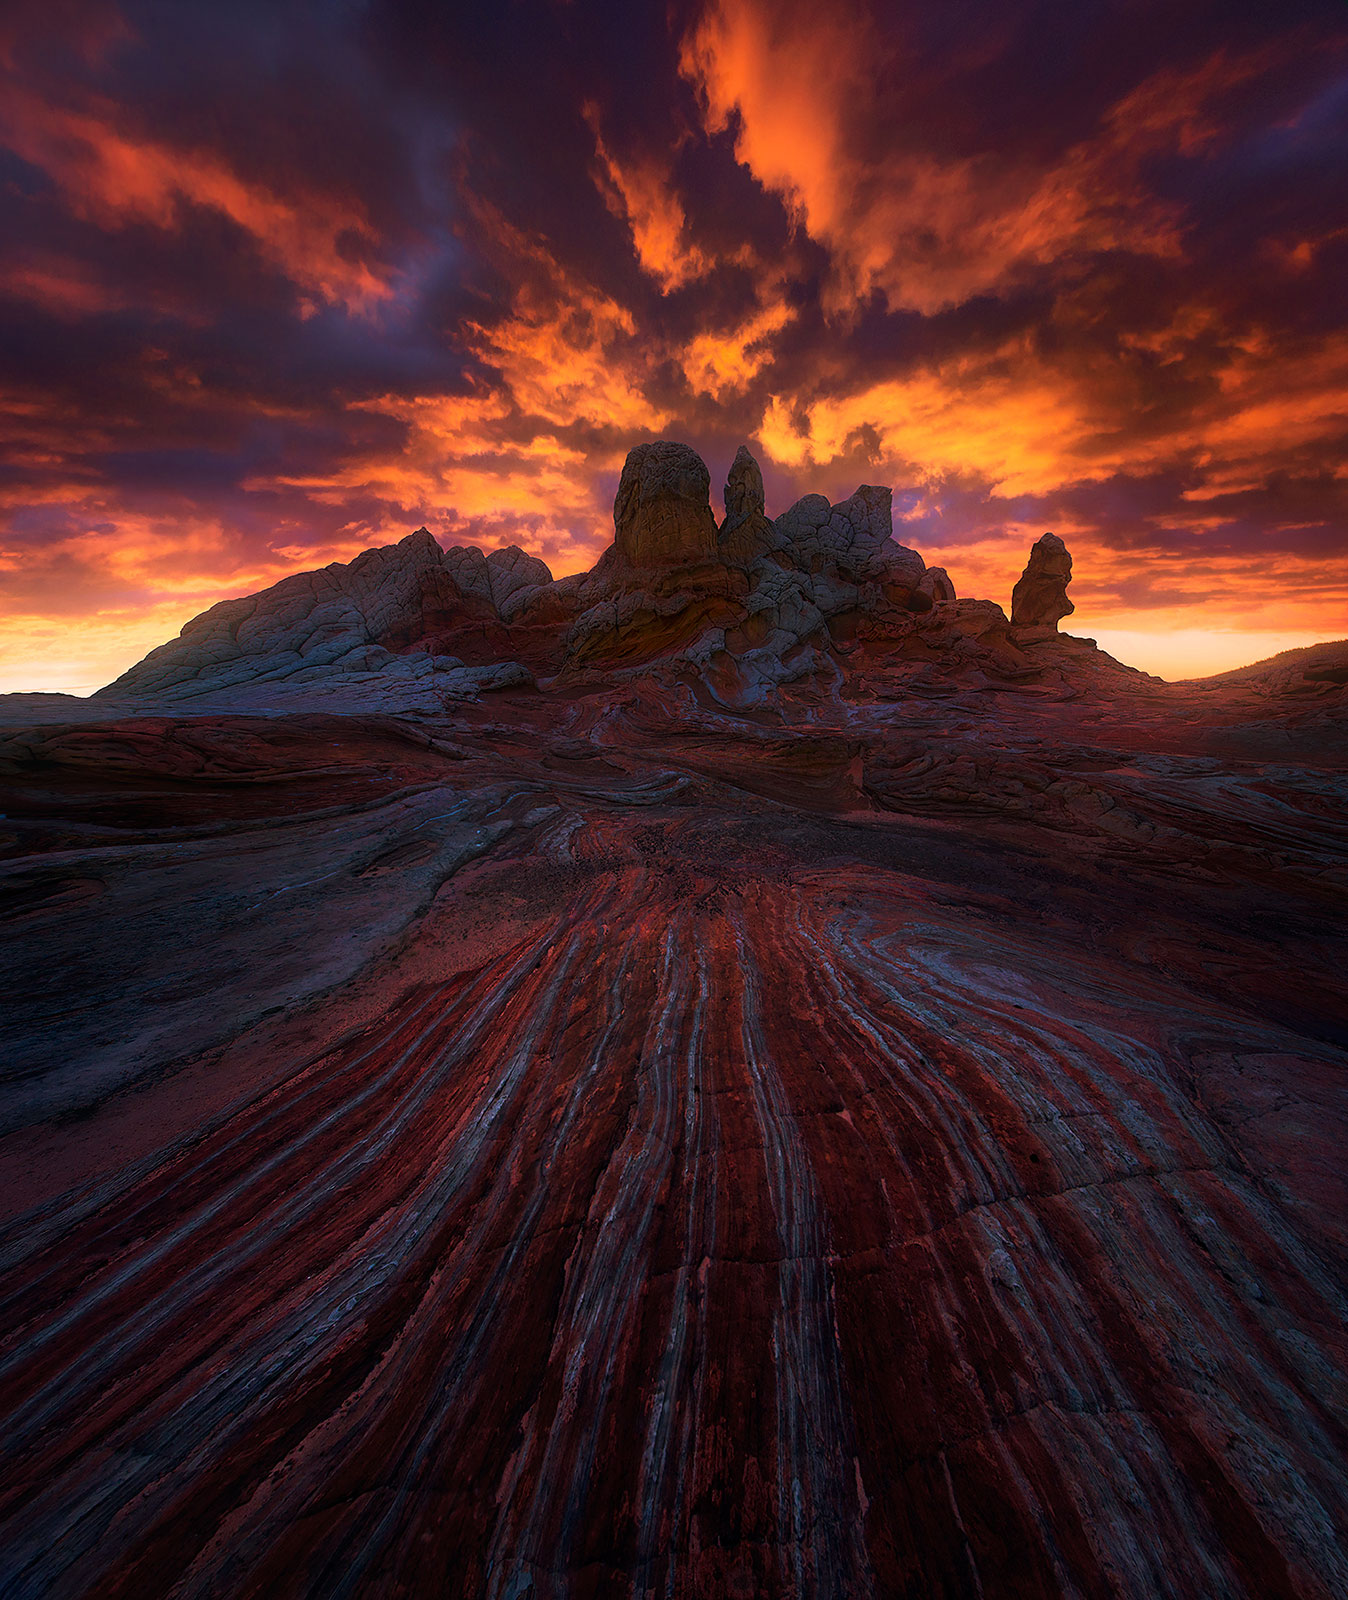 sunset, sandstone, dramatic, jagged, arizona, colorado plateau, photo